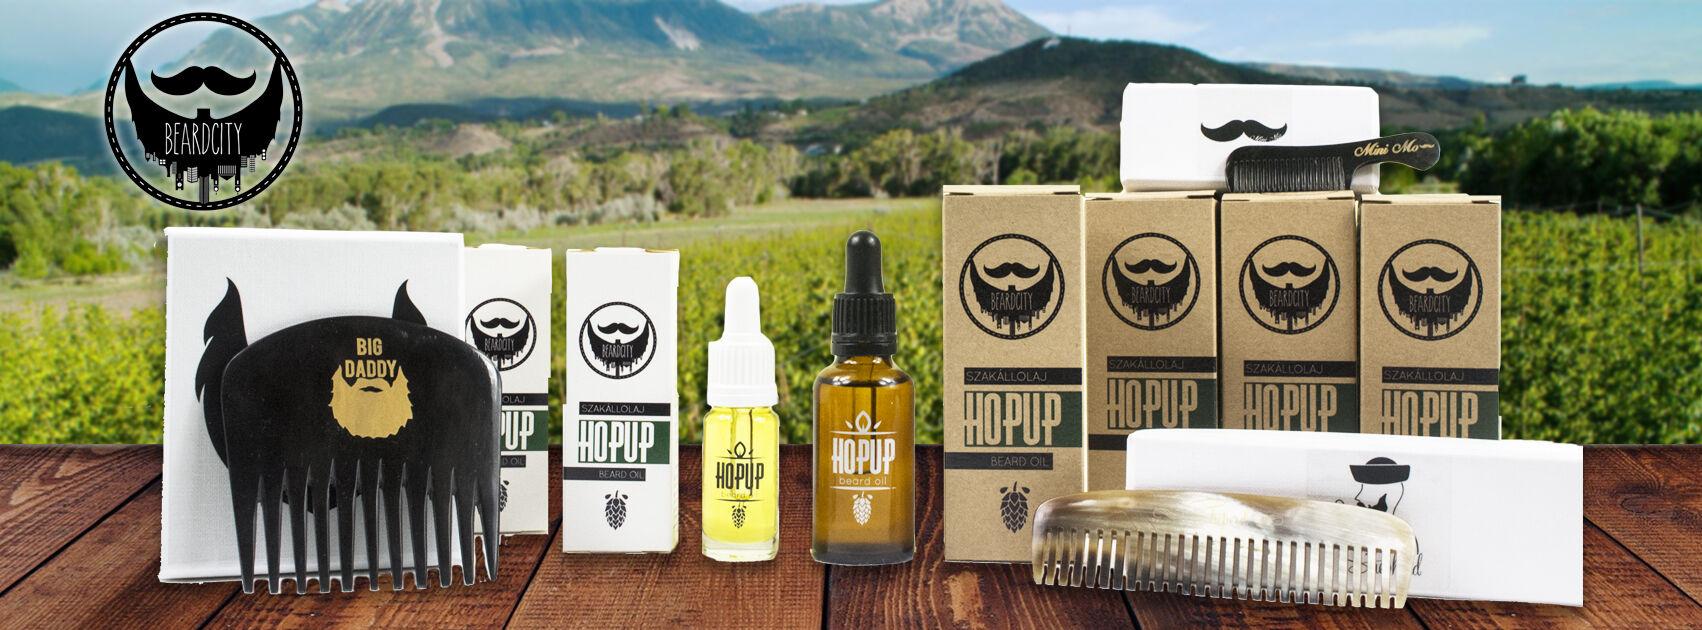 Beardcity termékek